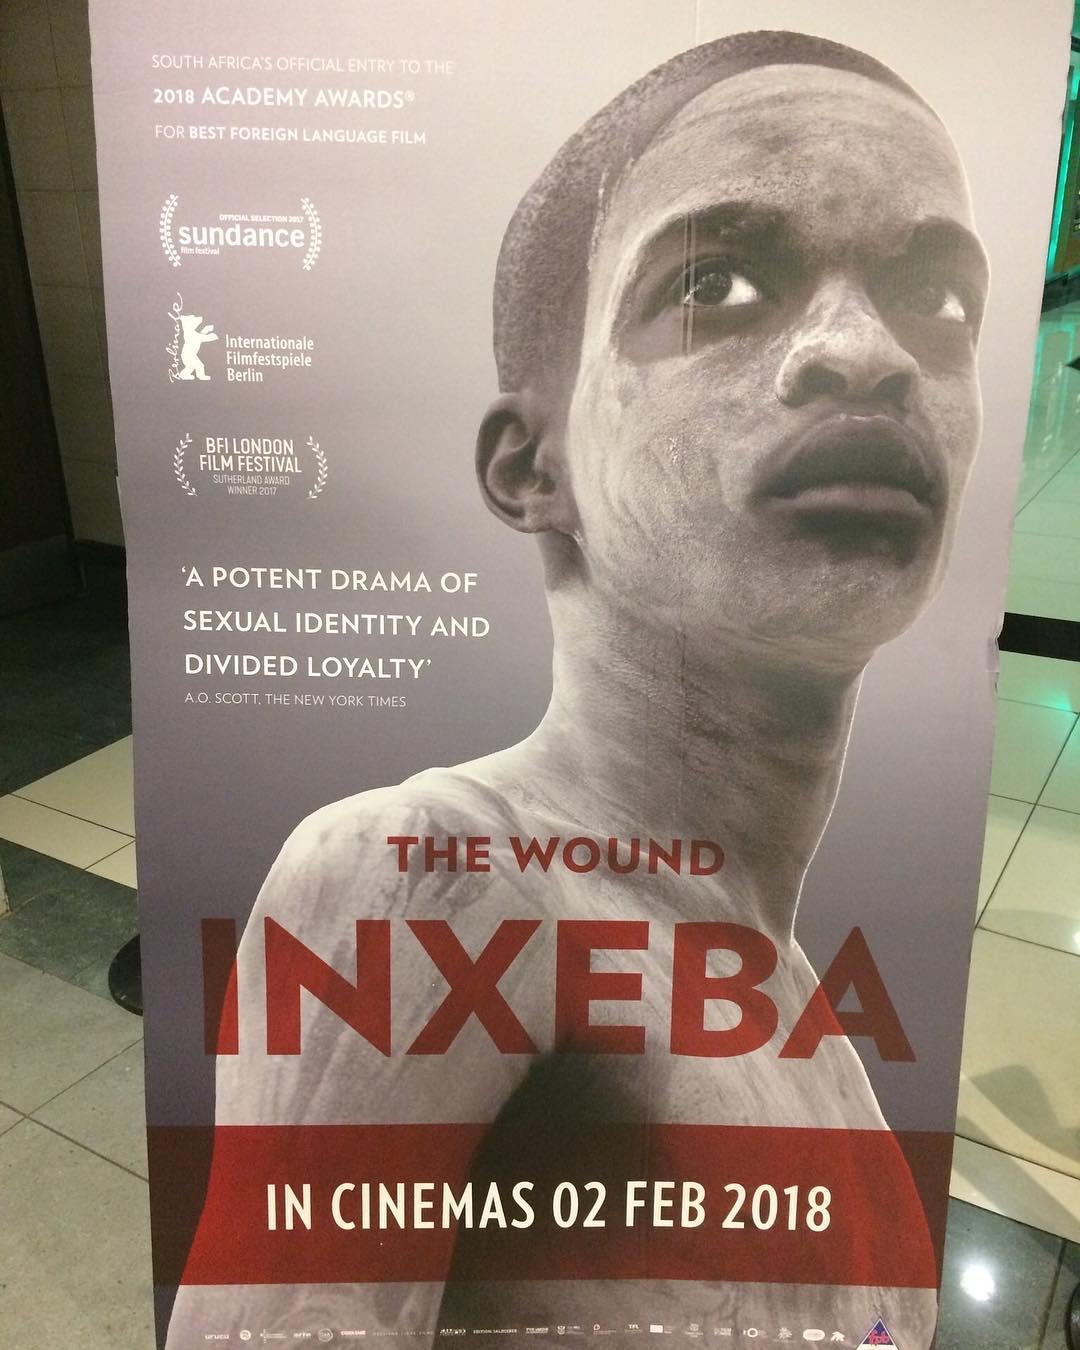 Inxeba to return to cinemas on Friday following court ruling